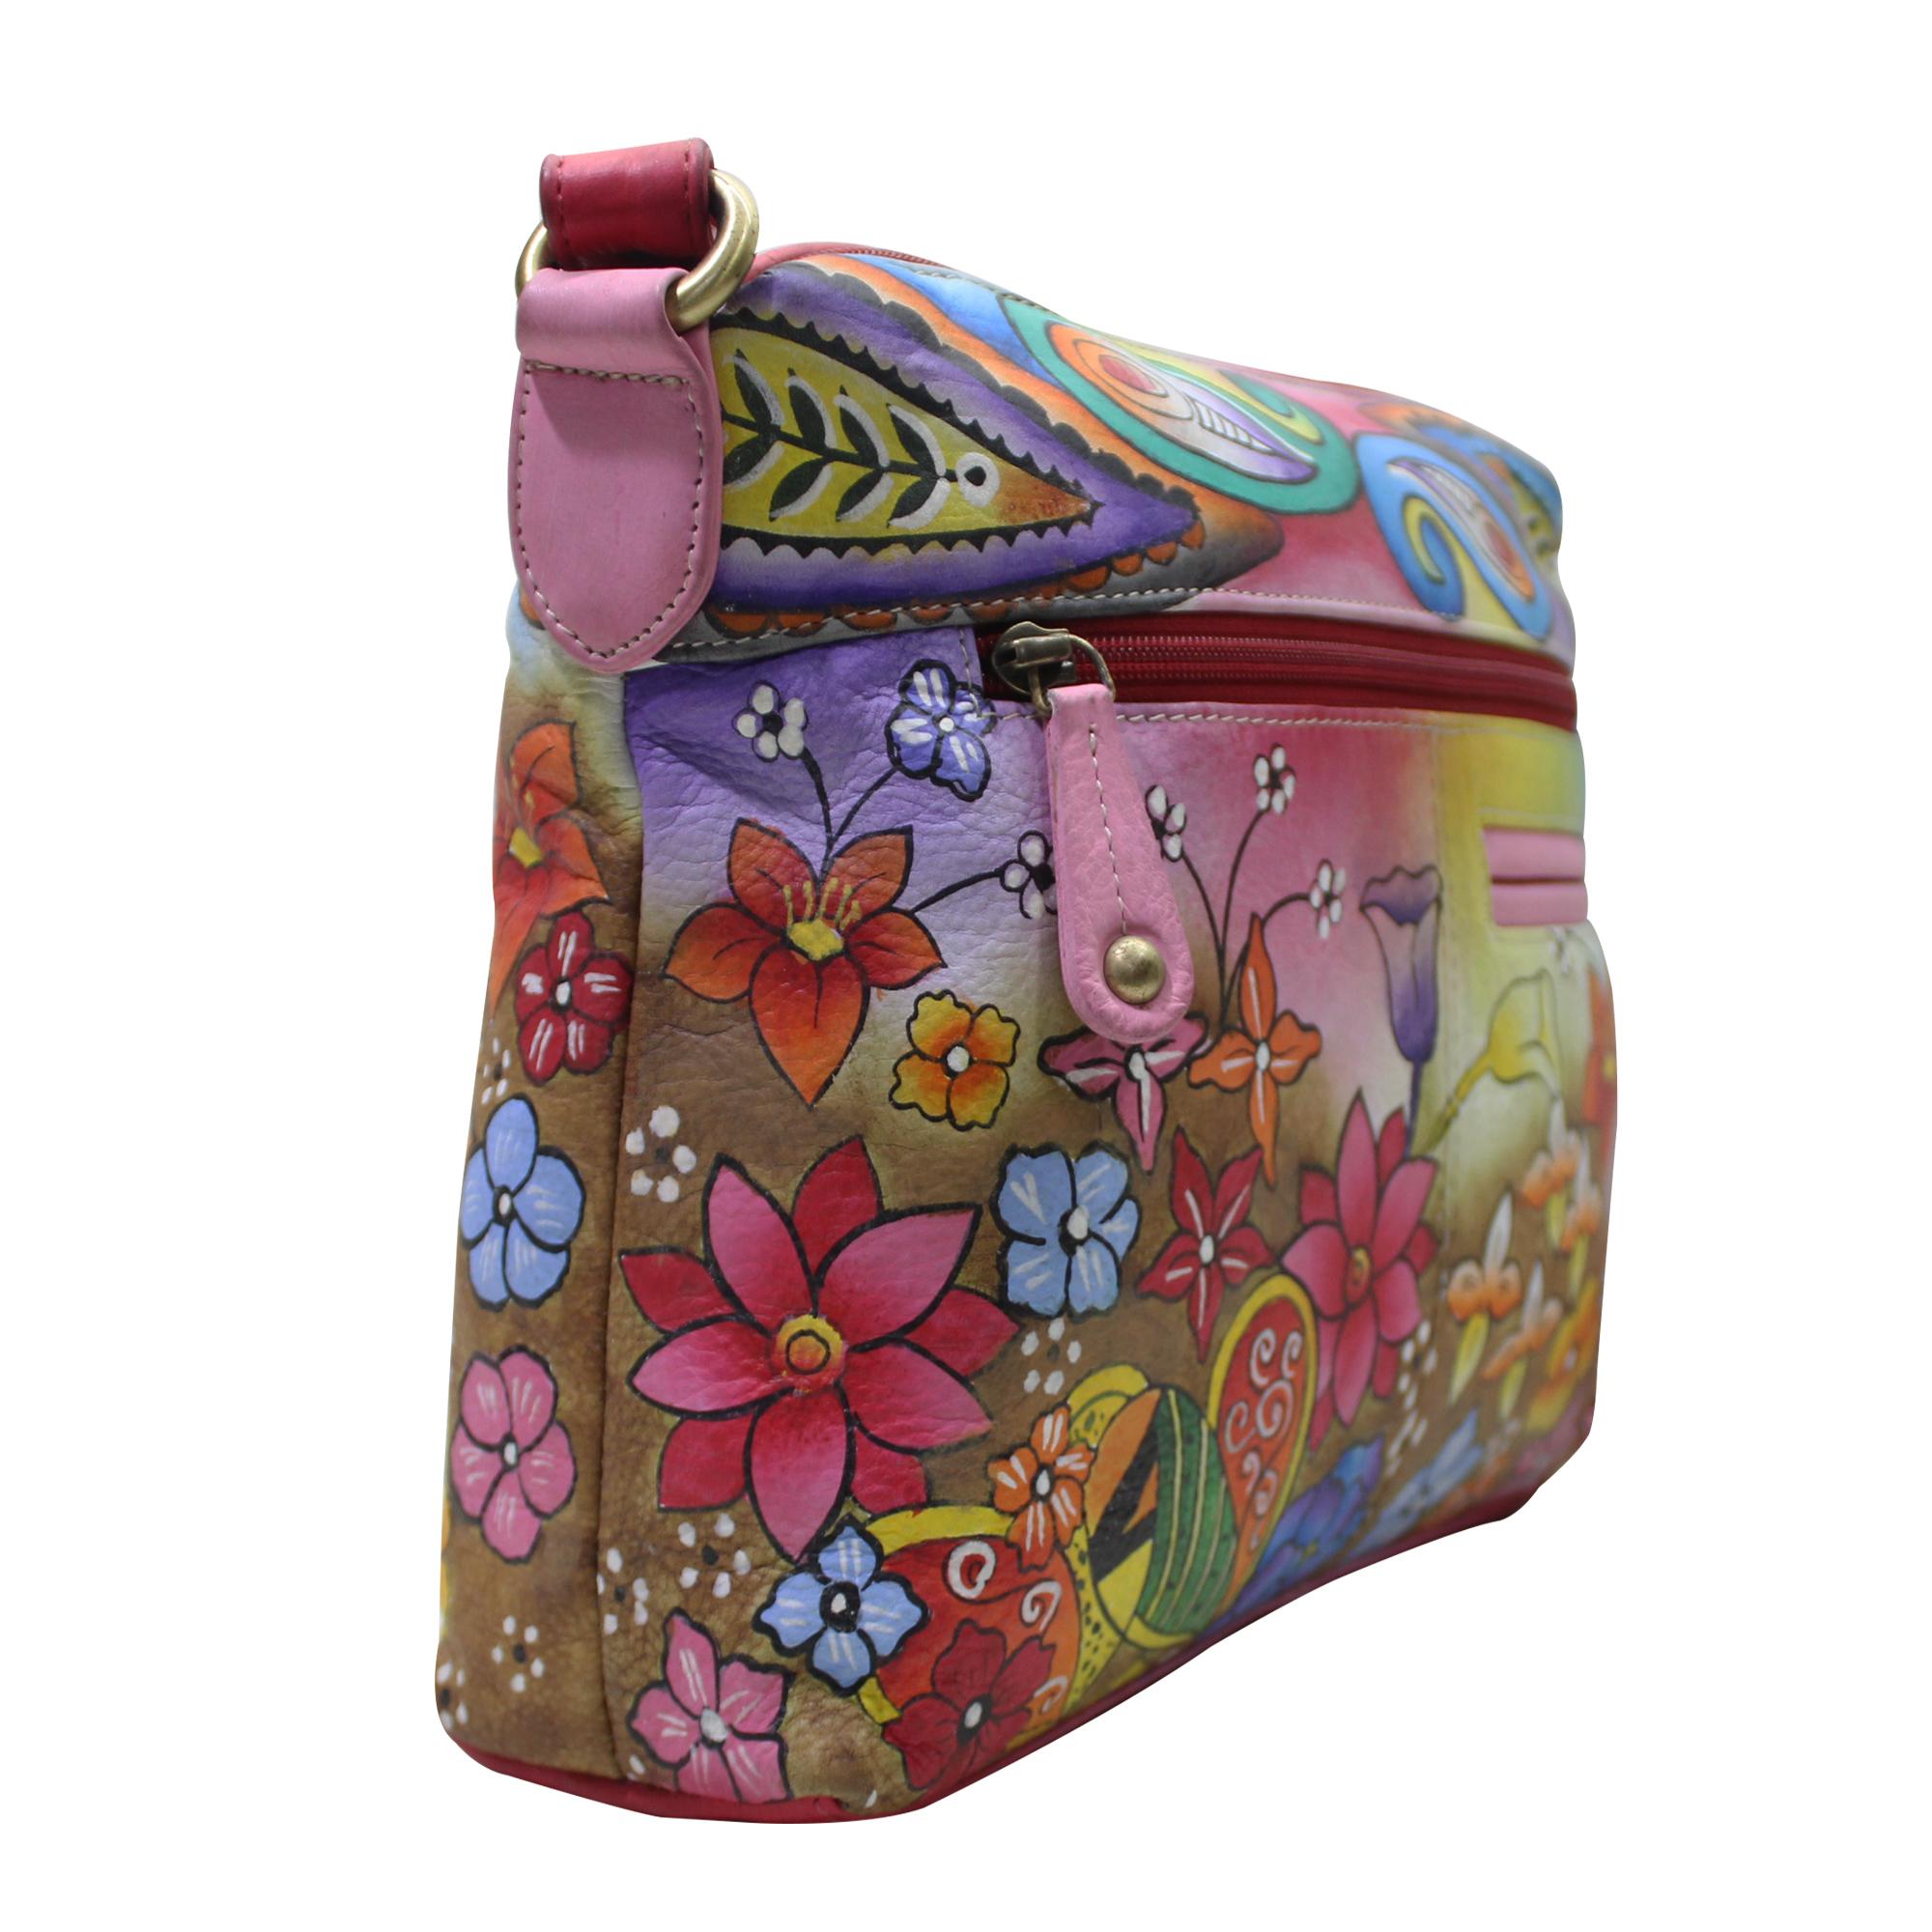 Hand Painted Leather Shoulder Bag